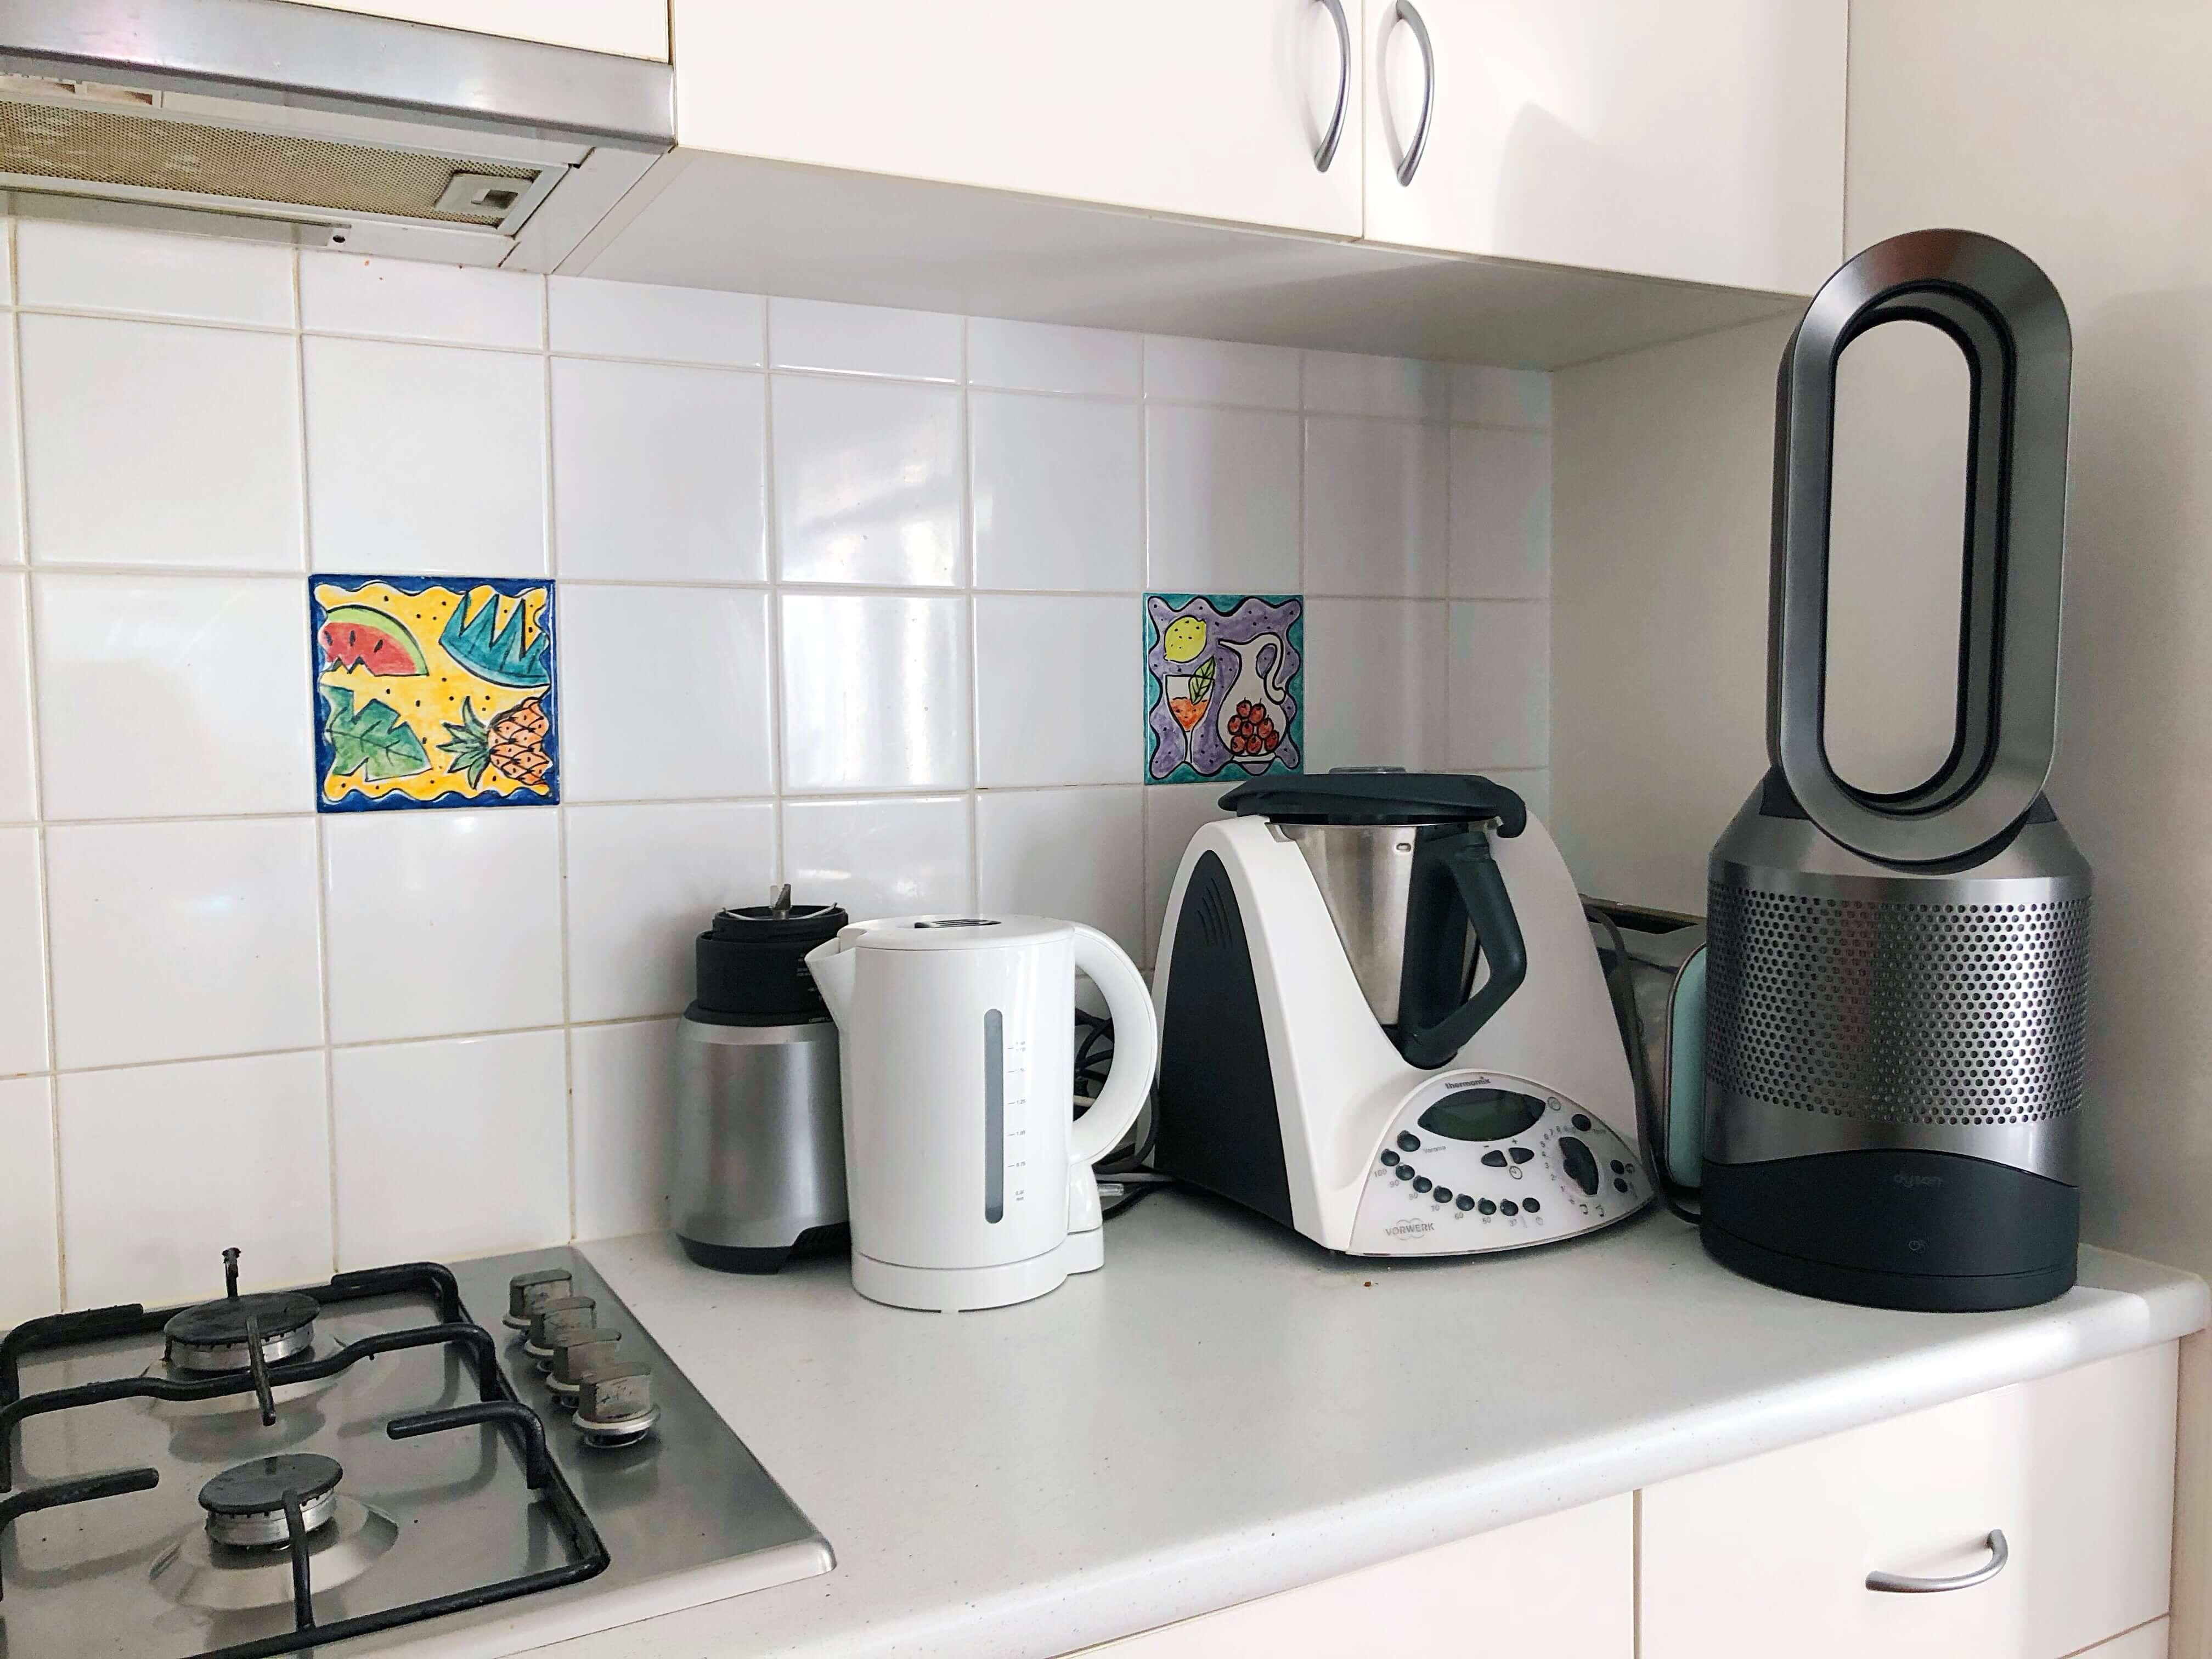 Dyson Pure Hot+Cool Air Purifier